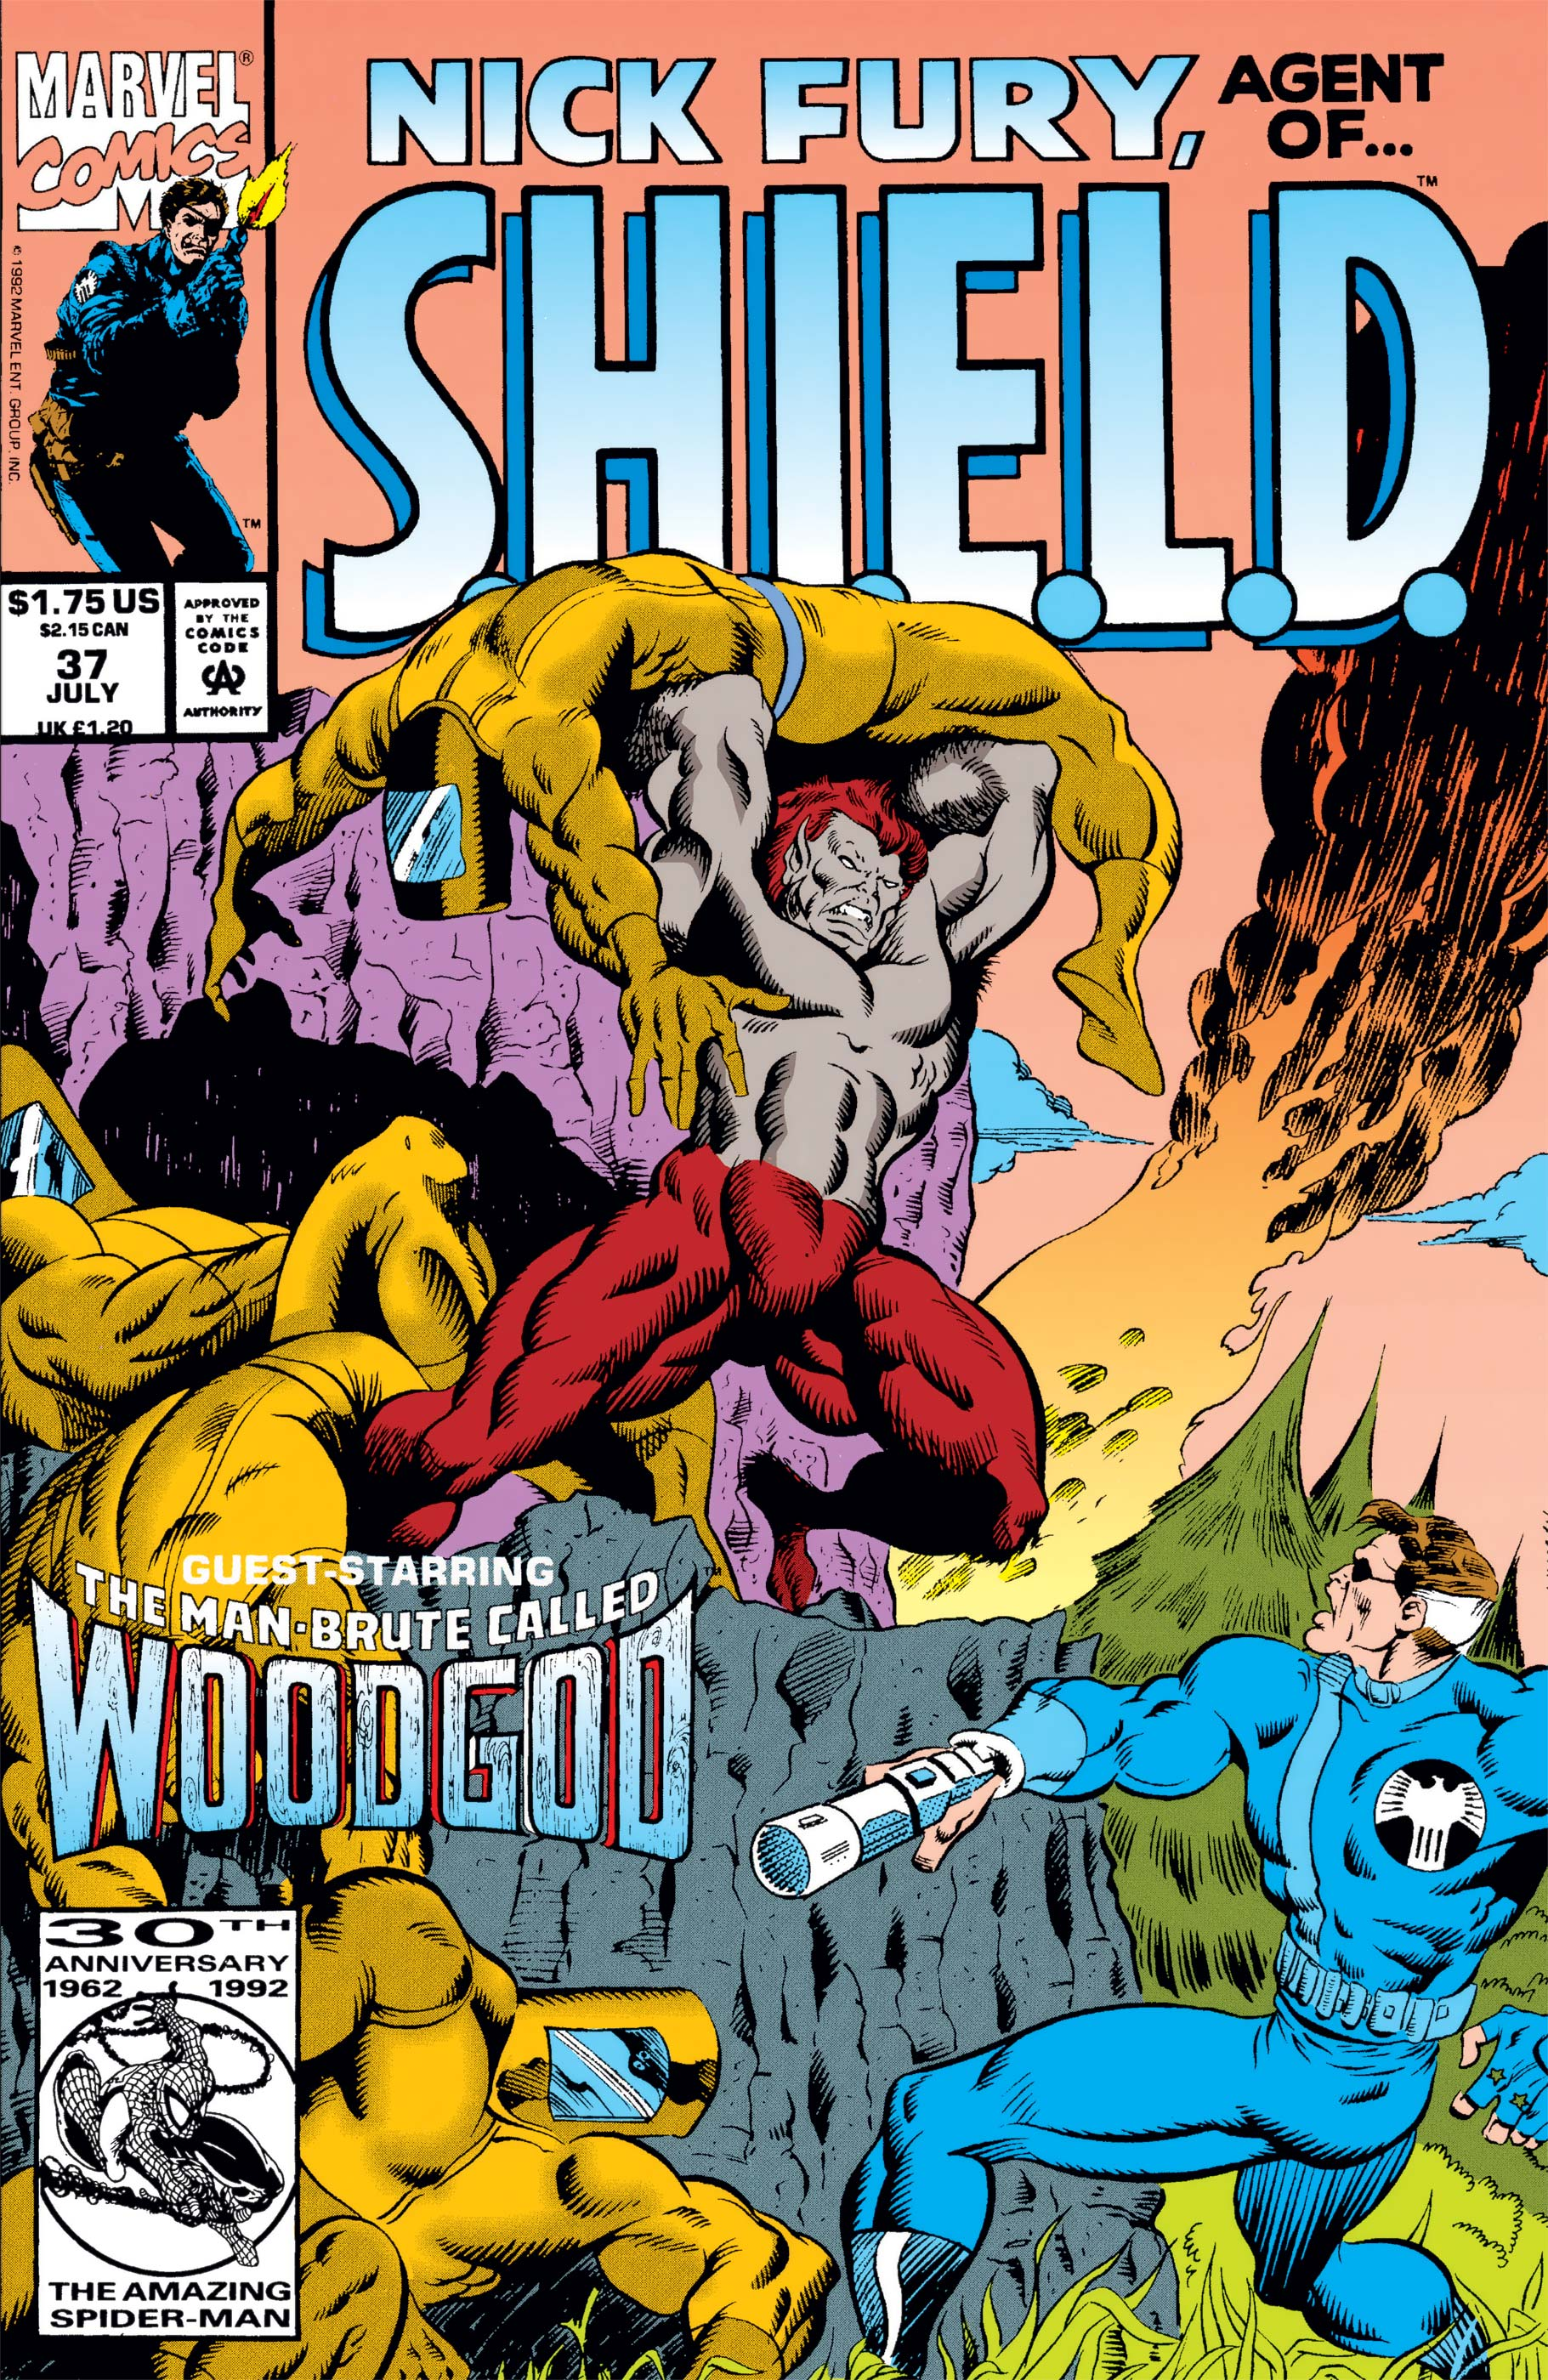 Nick Fury, Agent of S.H.I.E.L.D. (1989) #37